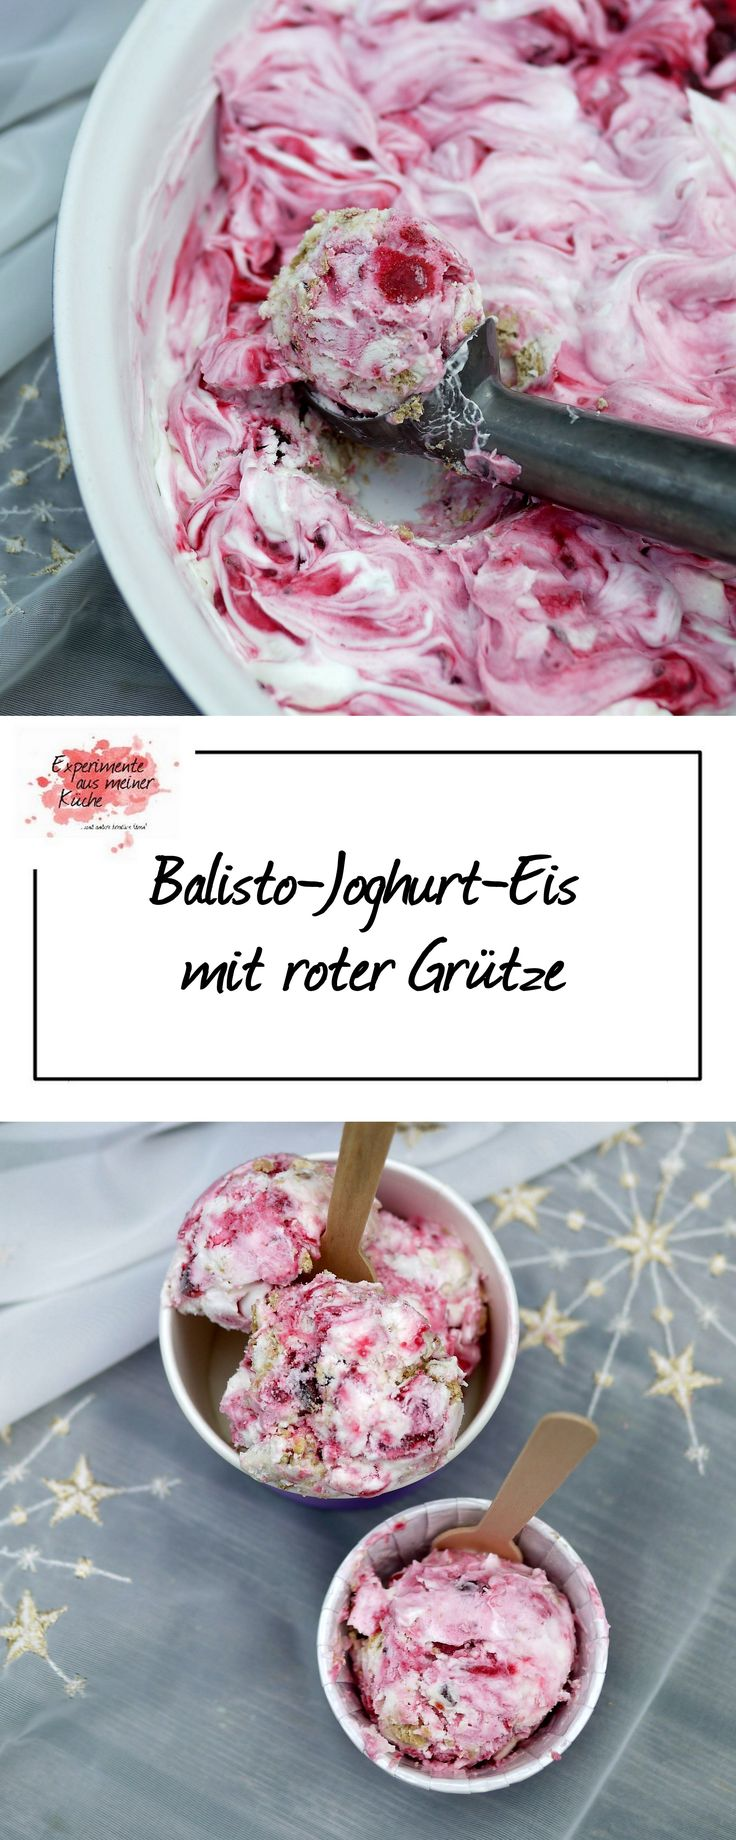 Balisto-Joghurt-Eis mit roter Grütze | Rezept